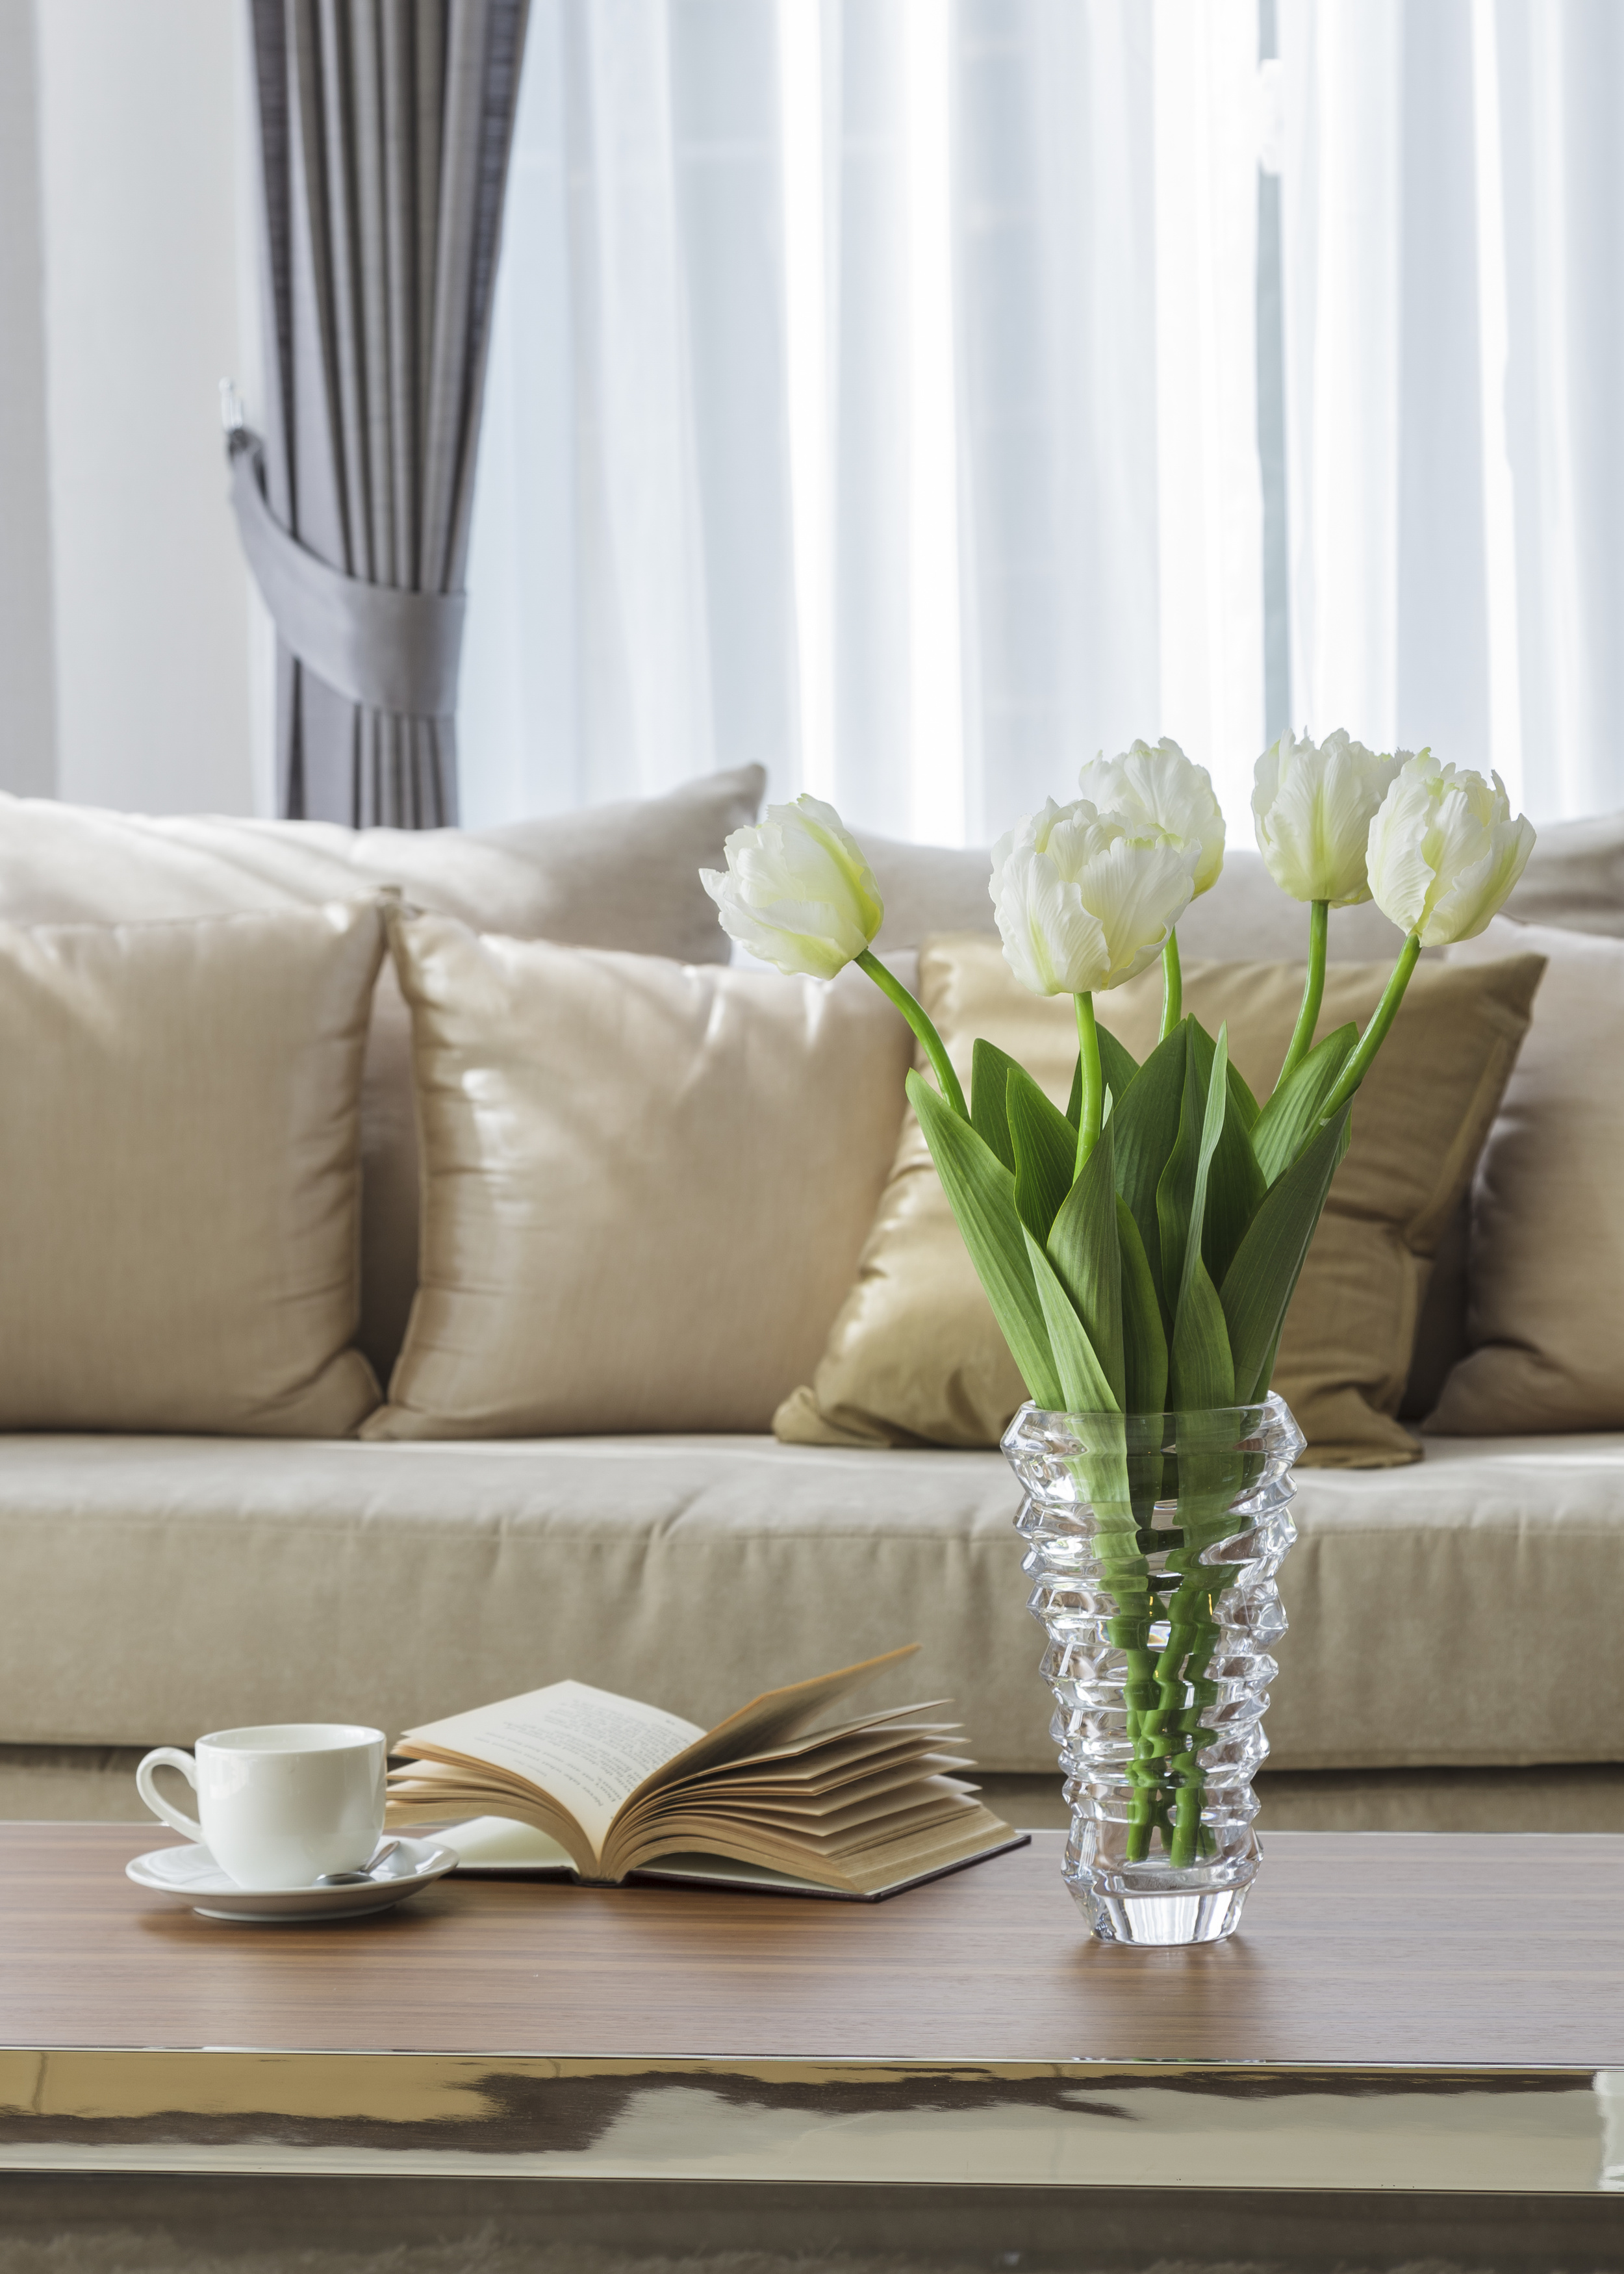 inspiring-home-interior-decor-florida-designer-spectacular-spaces-71359750.jpg